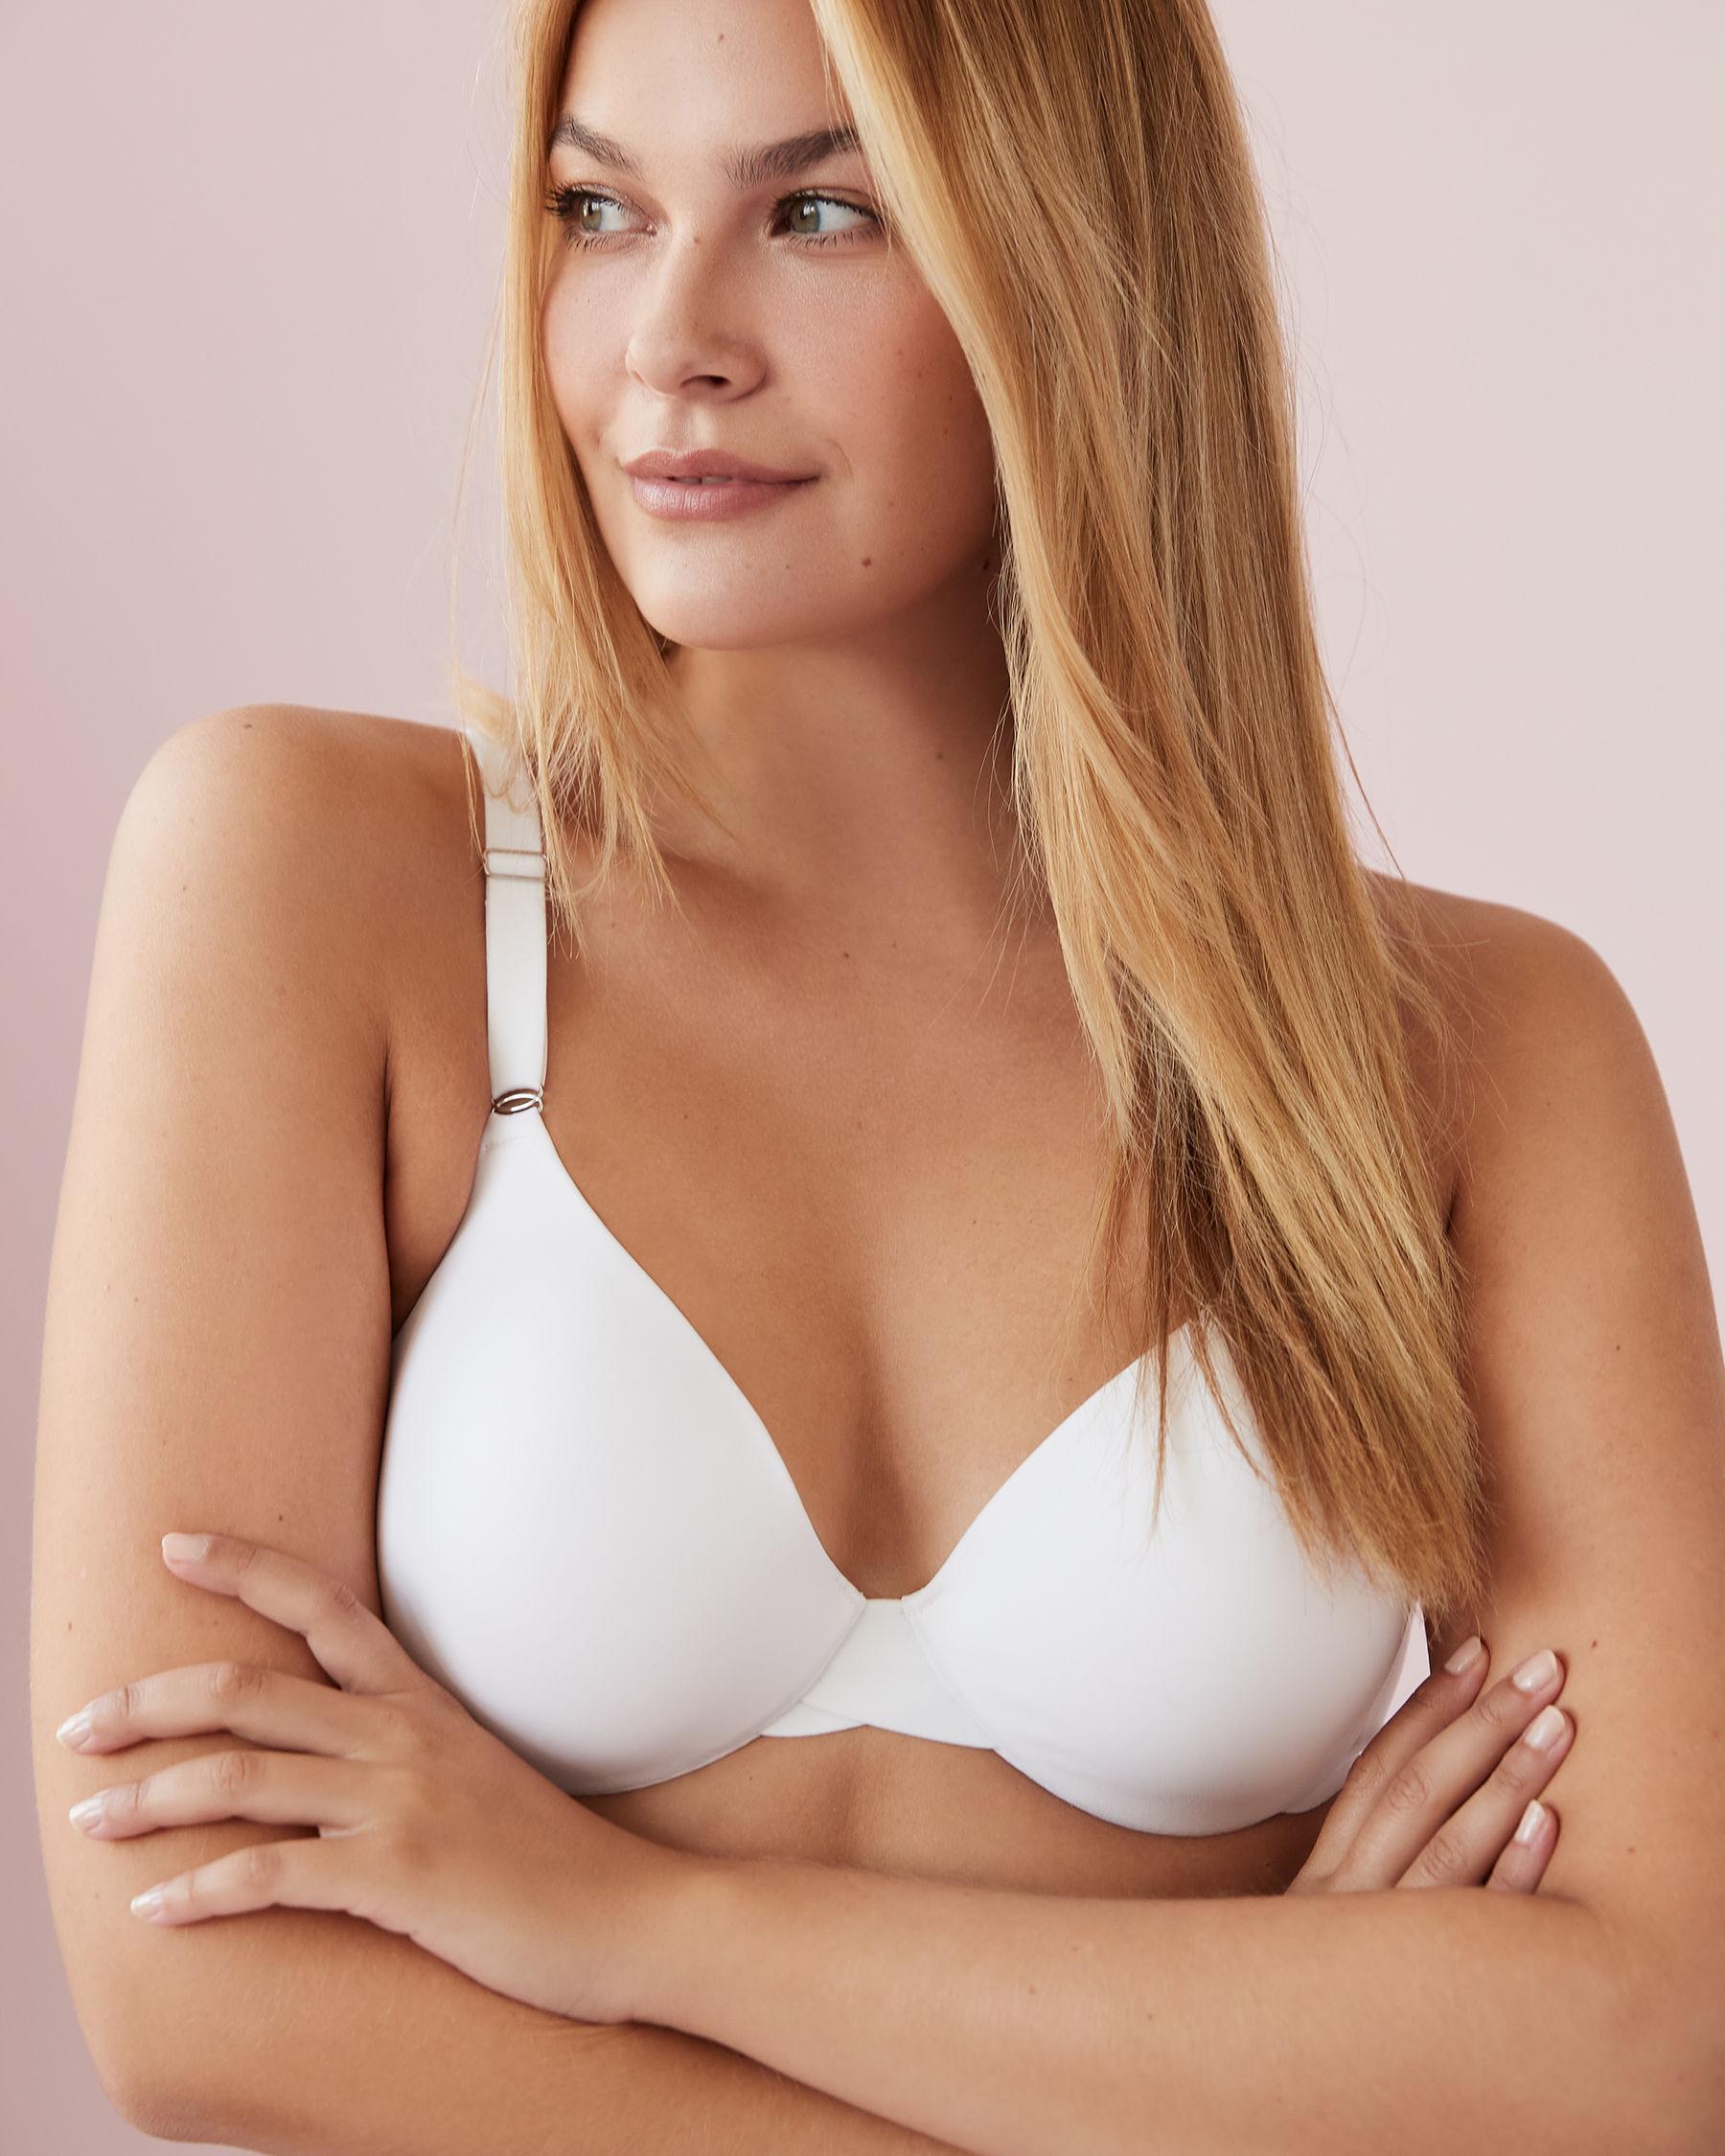 LA VIE EN ROSE Lightly Lined Sleek Back Bra White 169-113-1-00 - View7